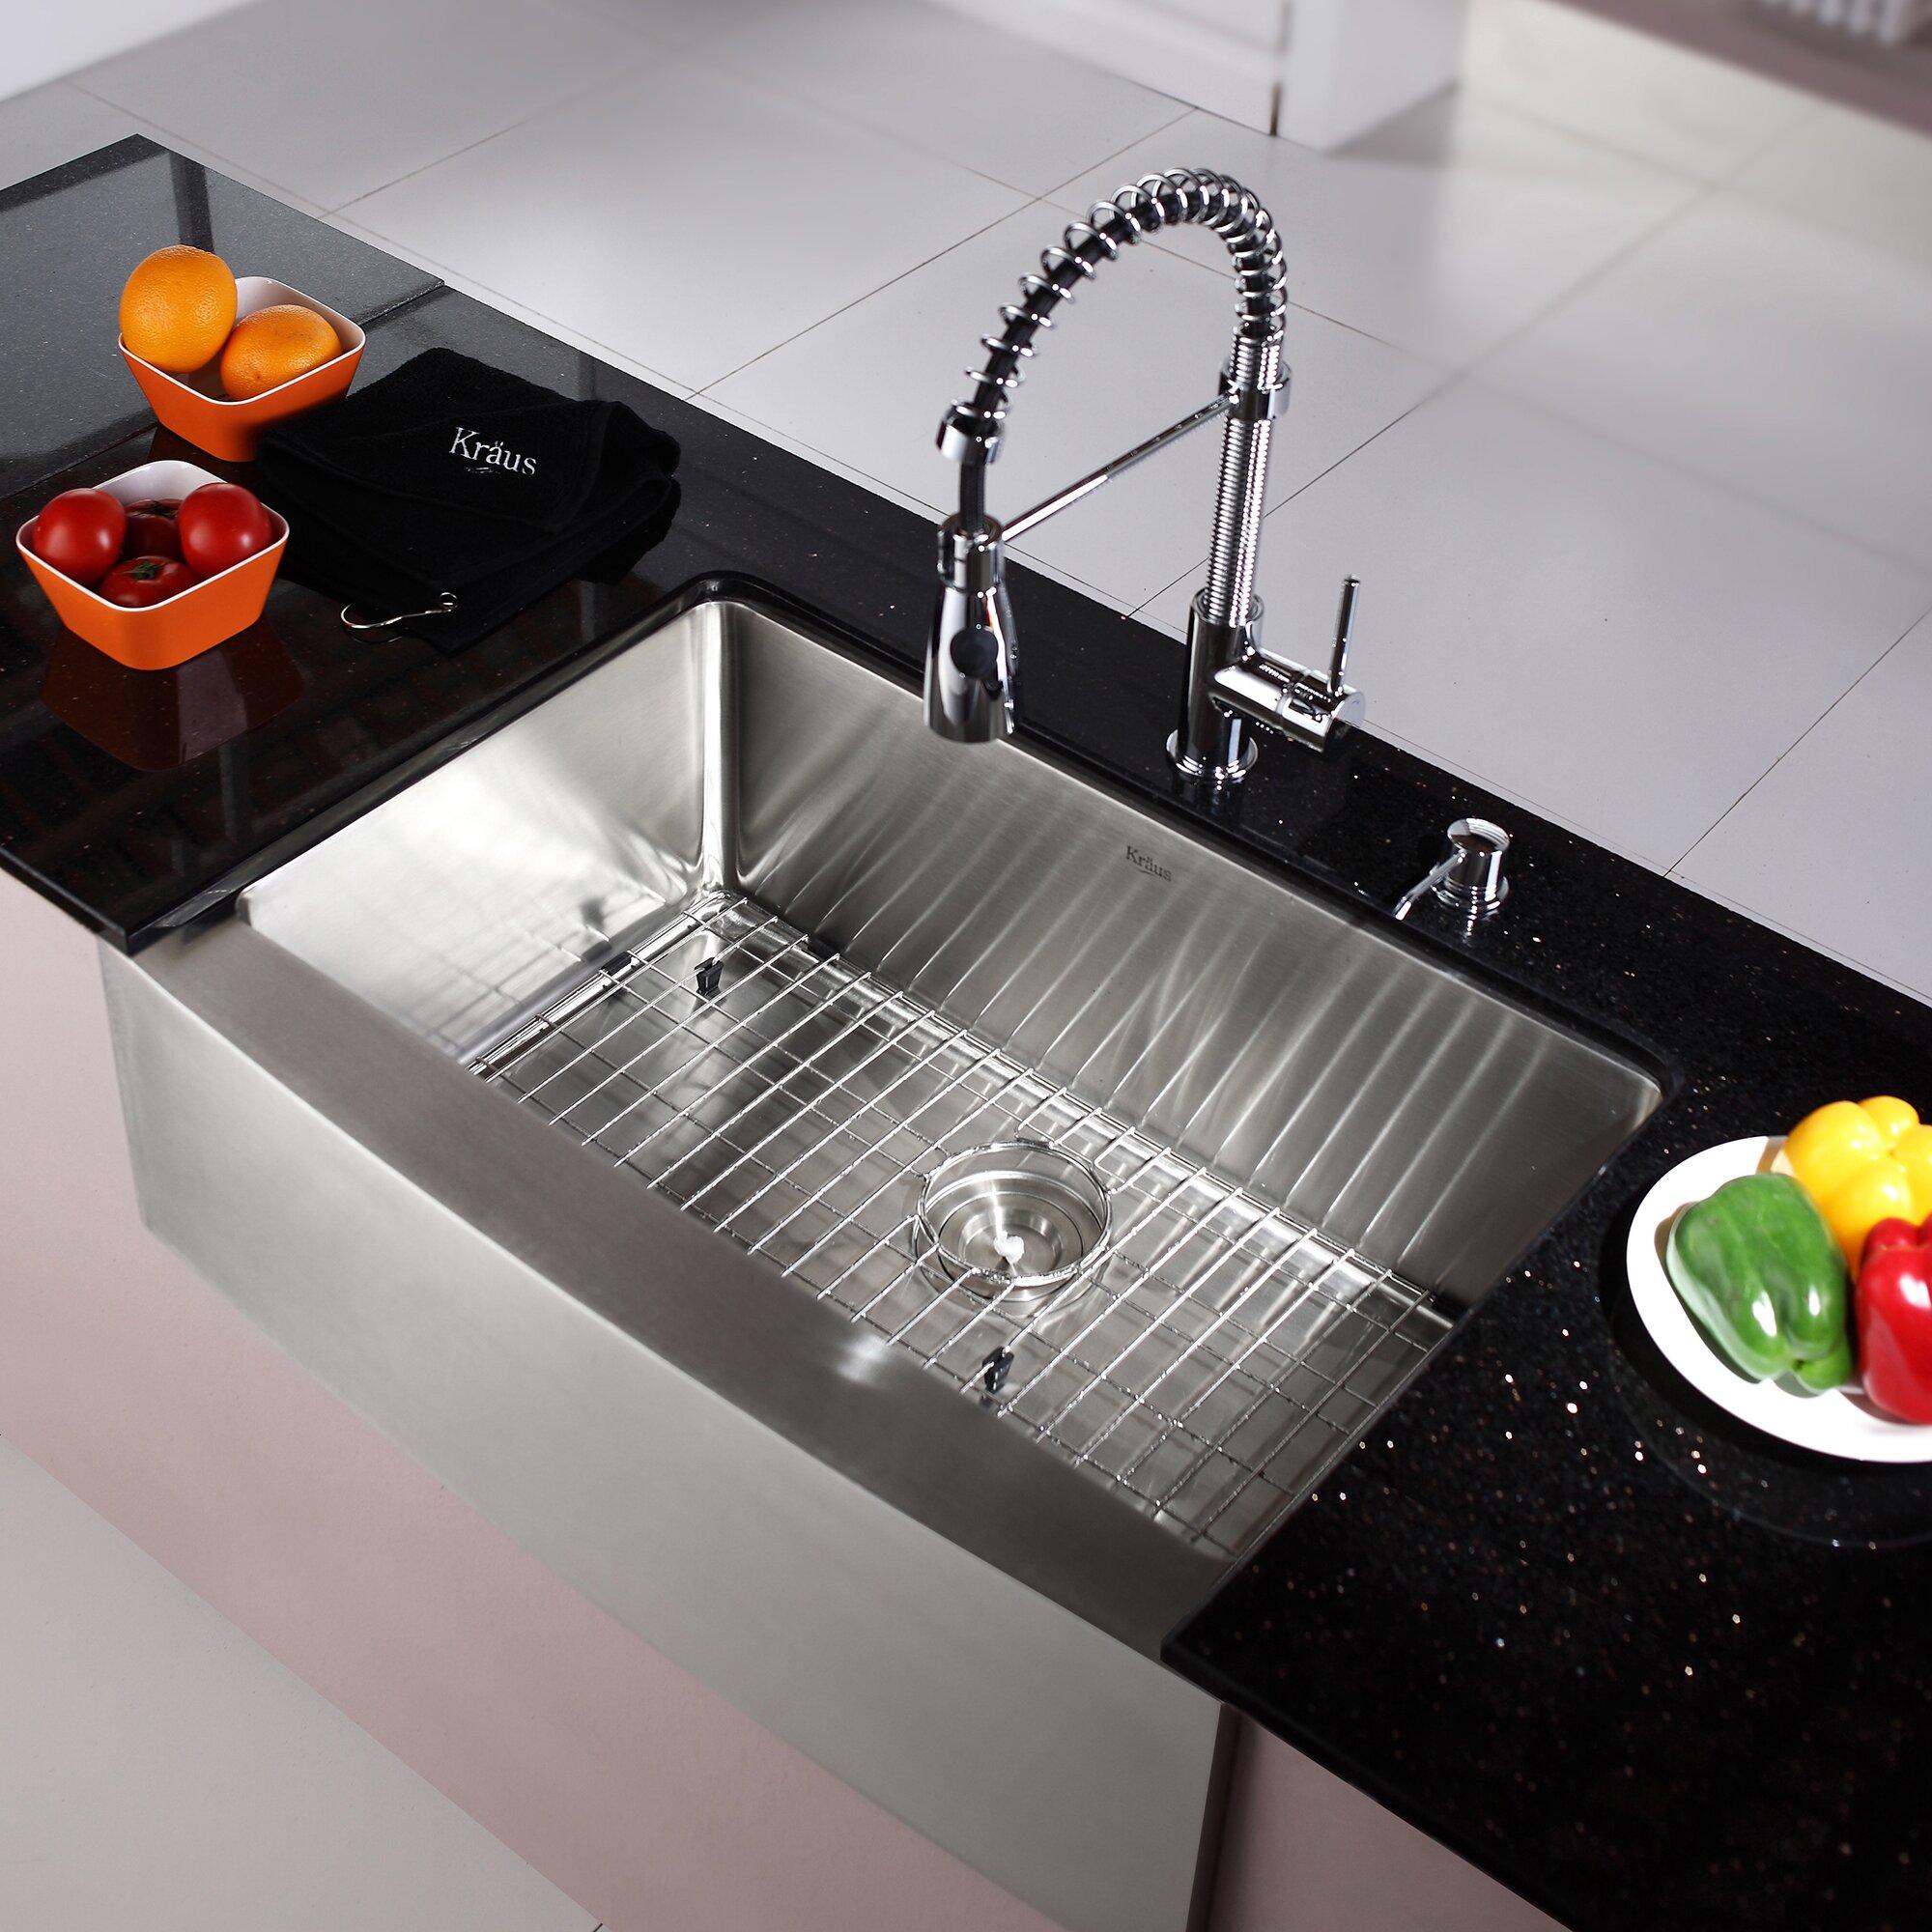 kitchen combos 30 x 20 single basin farmhouseapron kitchen sink with faucet - Kitchen Basin Sinks